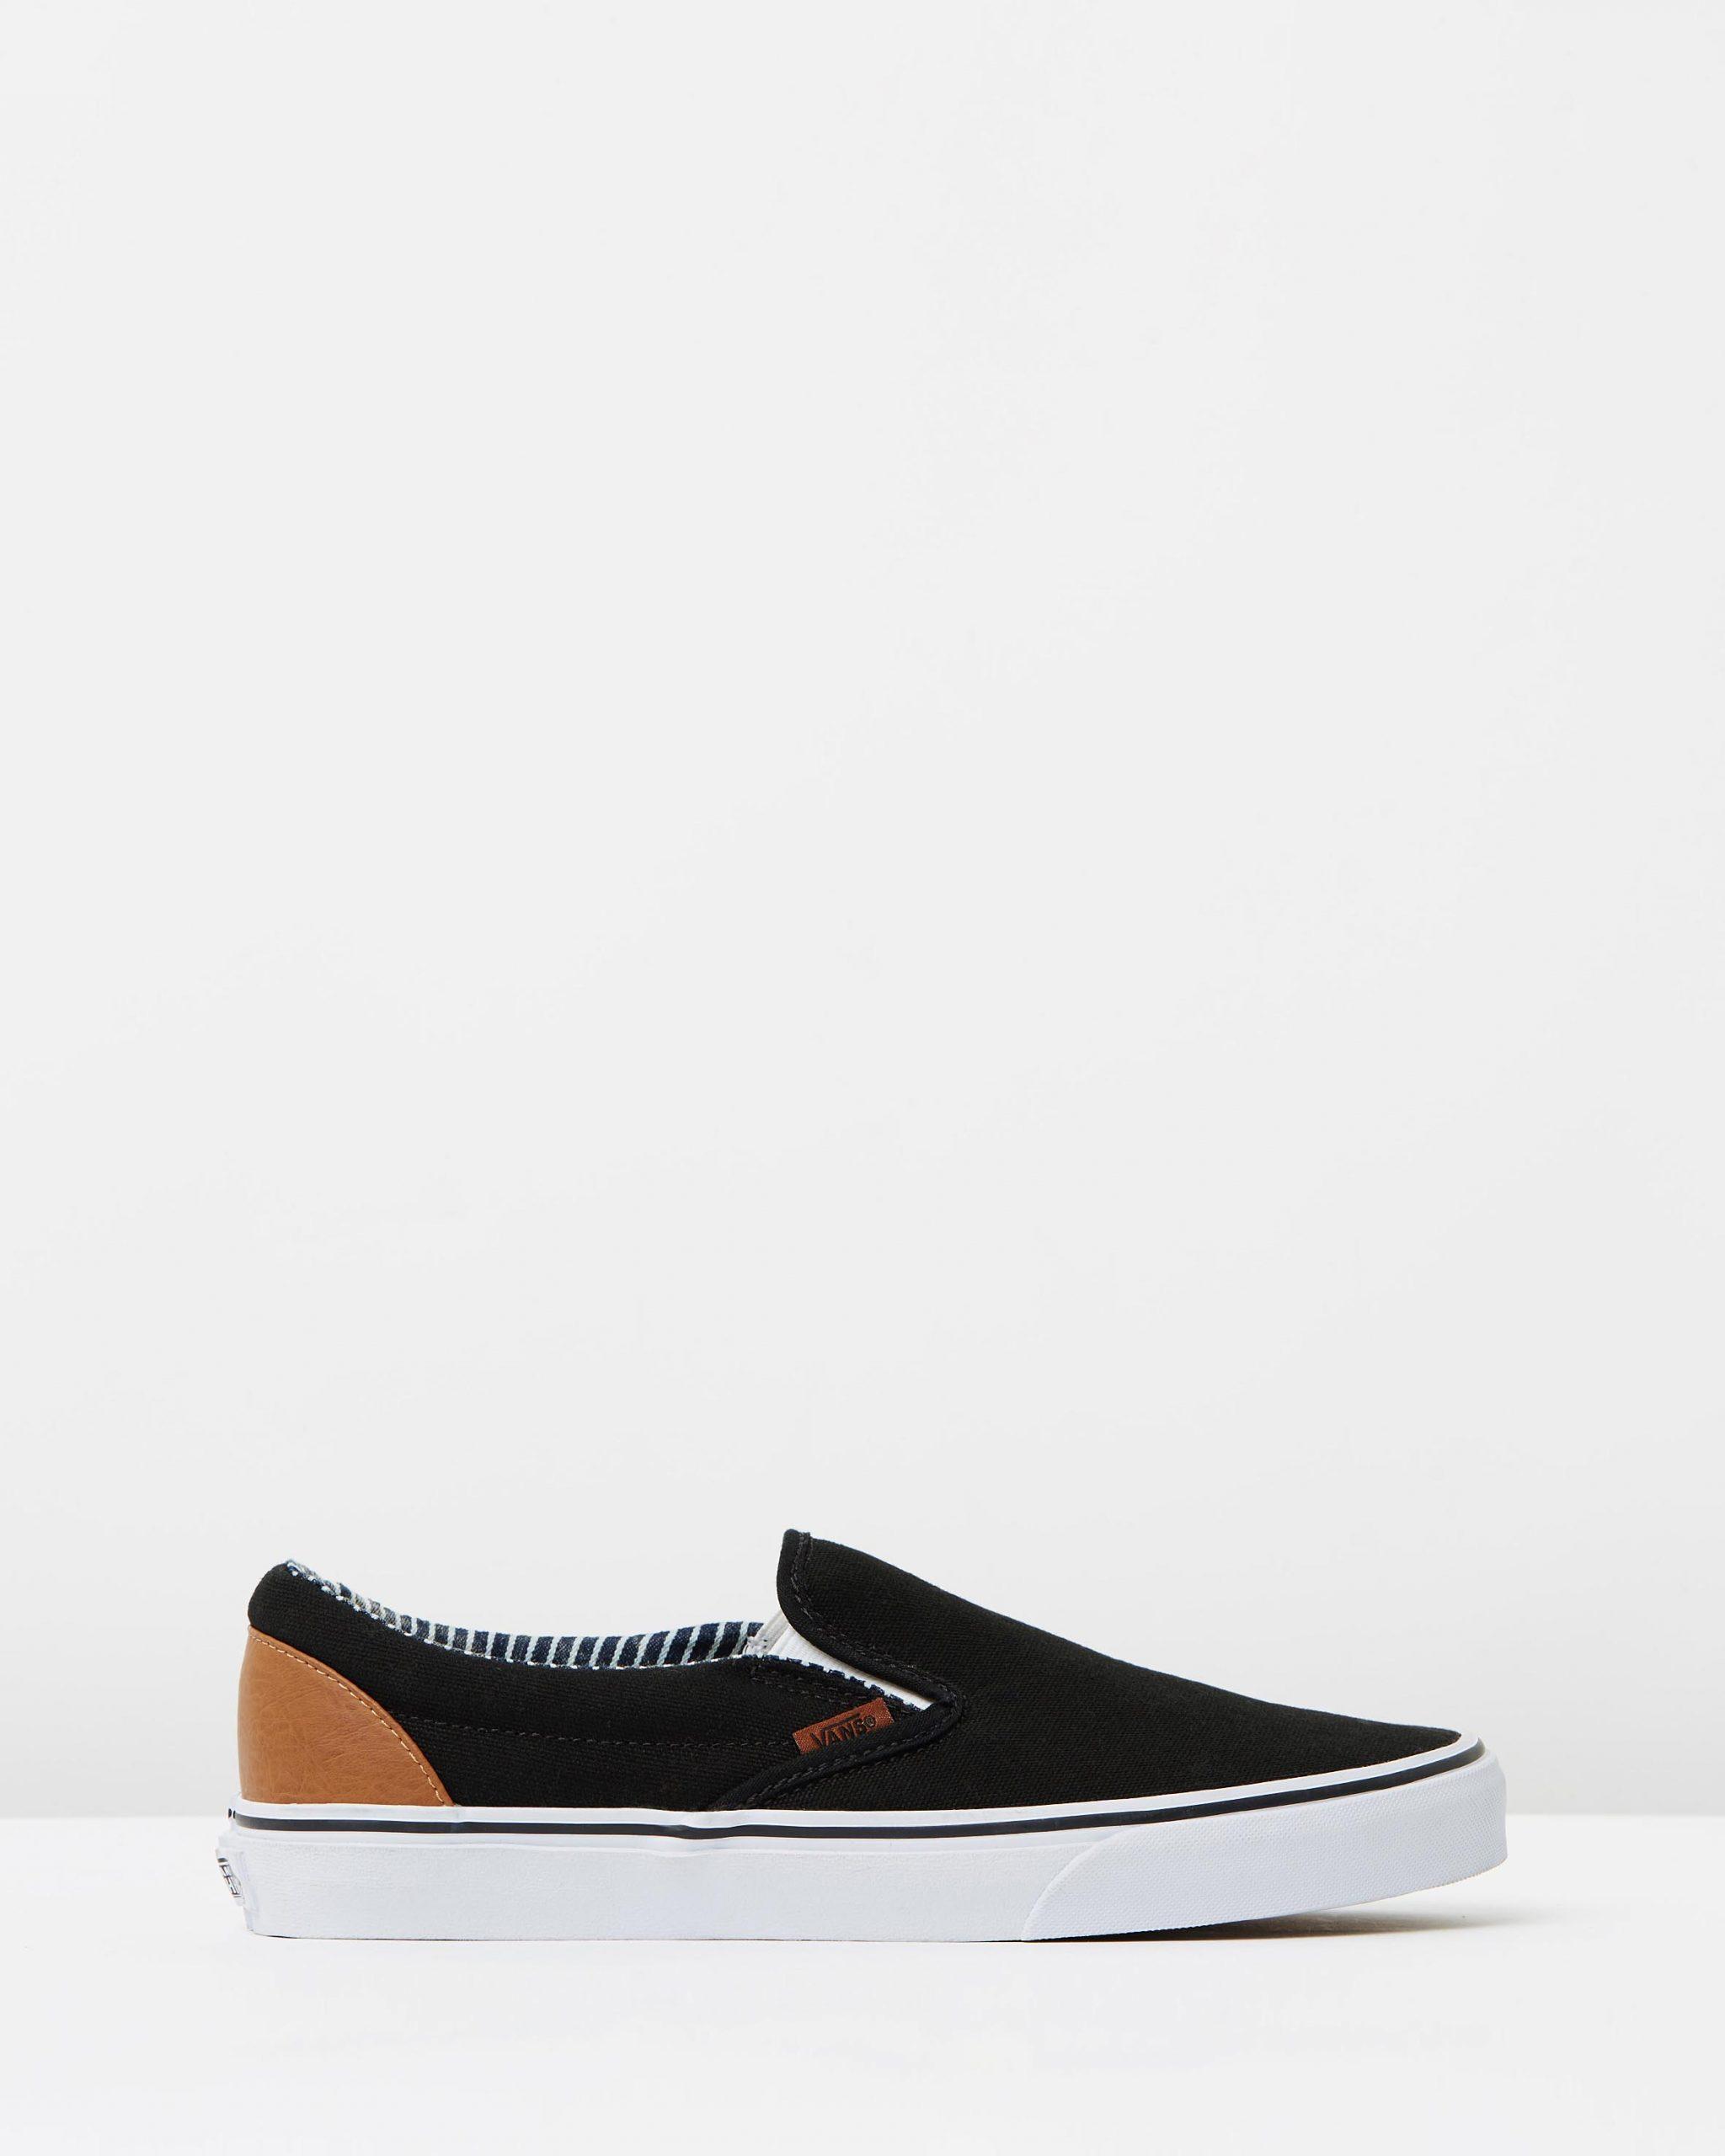 Vans Wmns Slip-on Black/stripe Denim